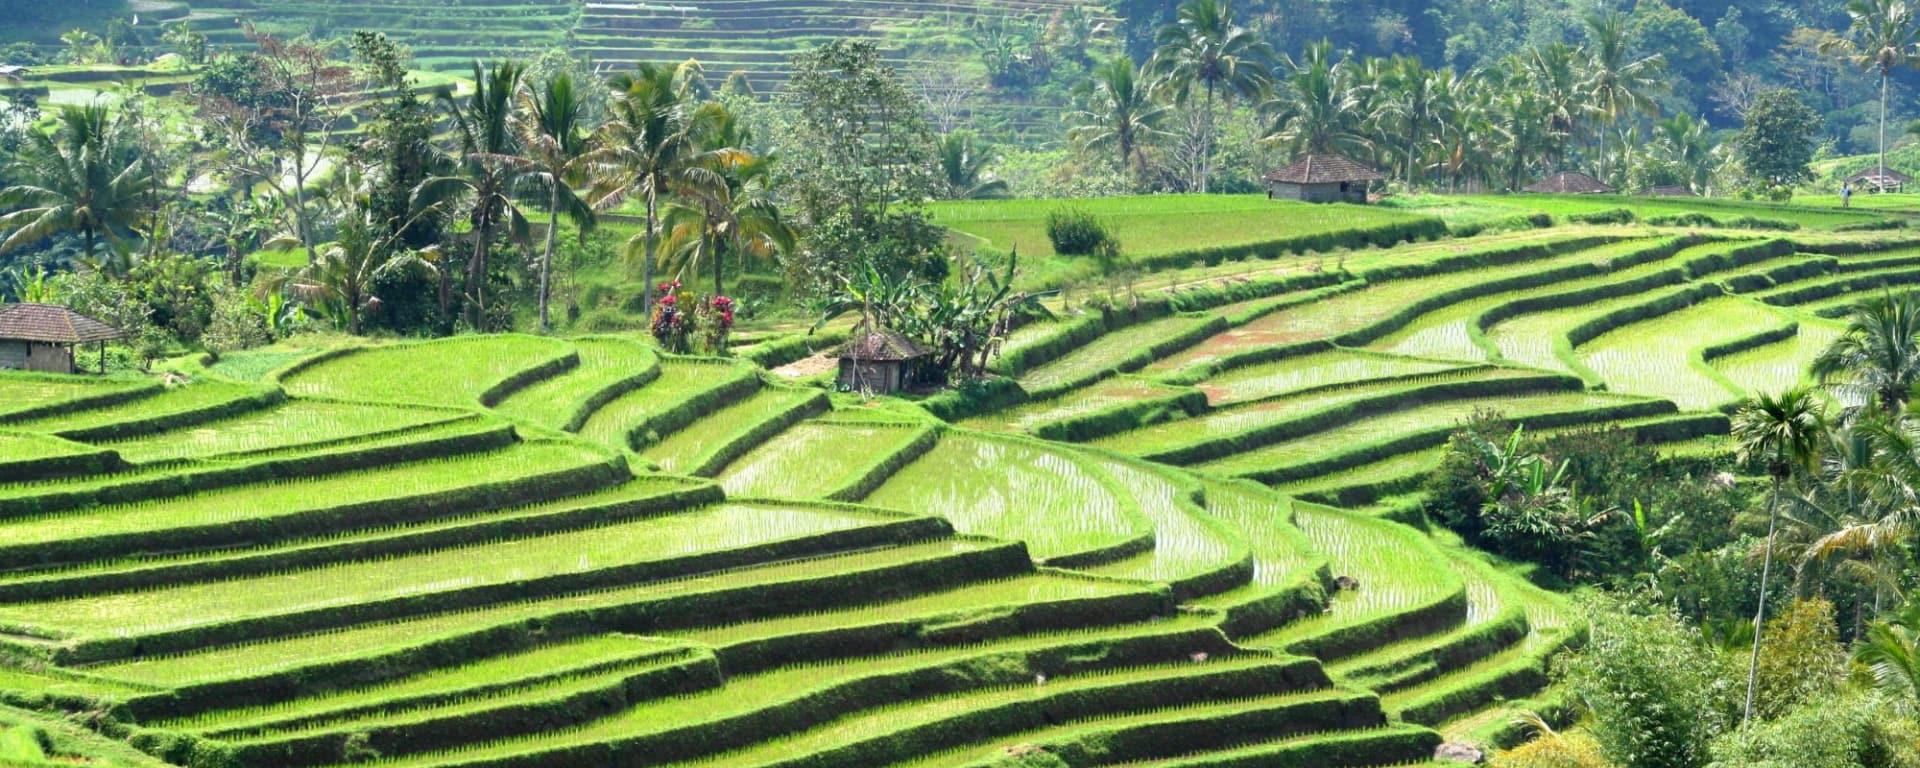 Mount Batur - Kontrastreiches Bali in Südbali: Bali Rice Terraces